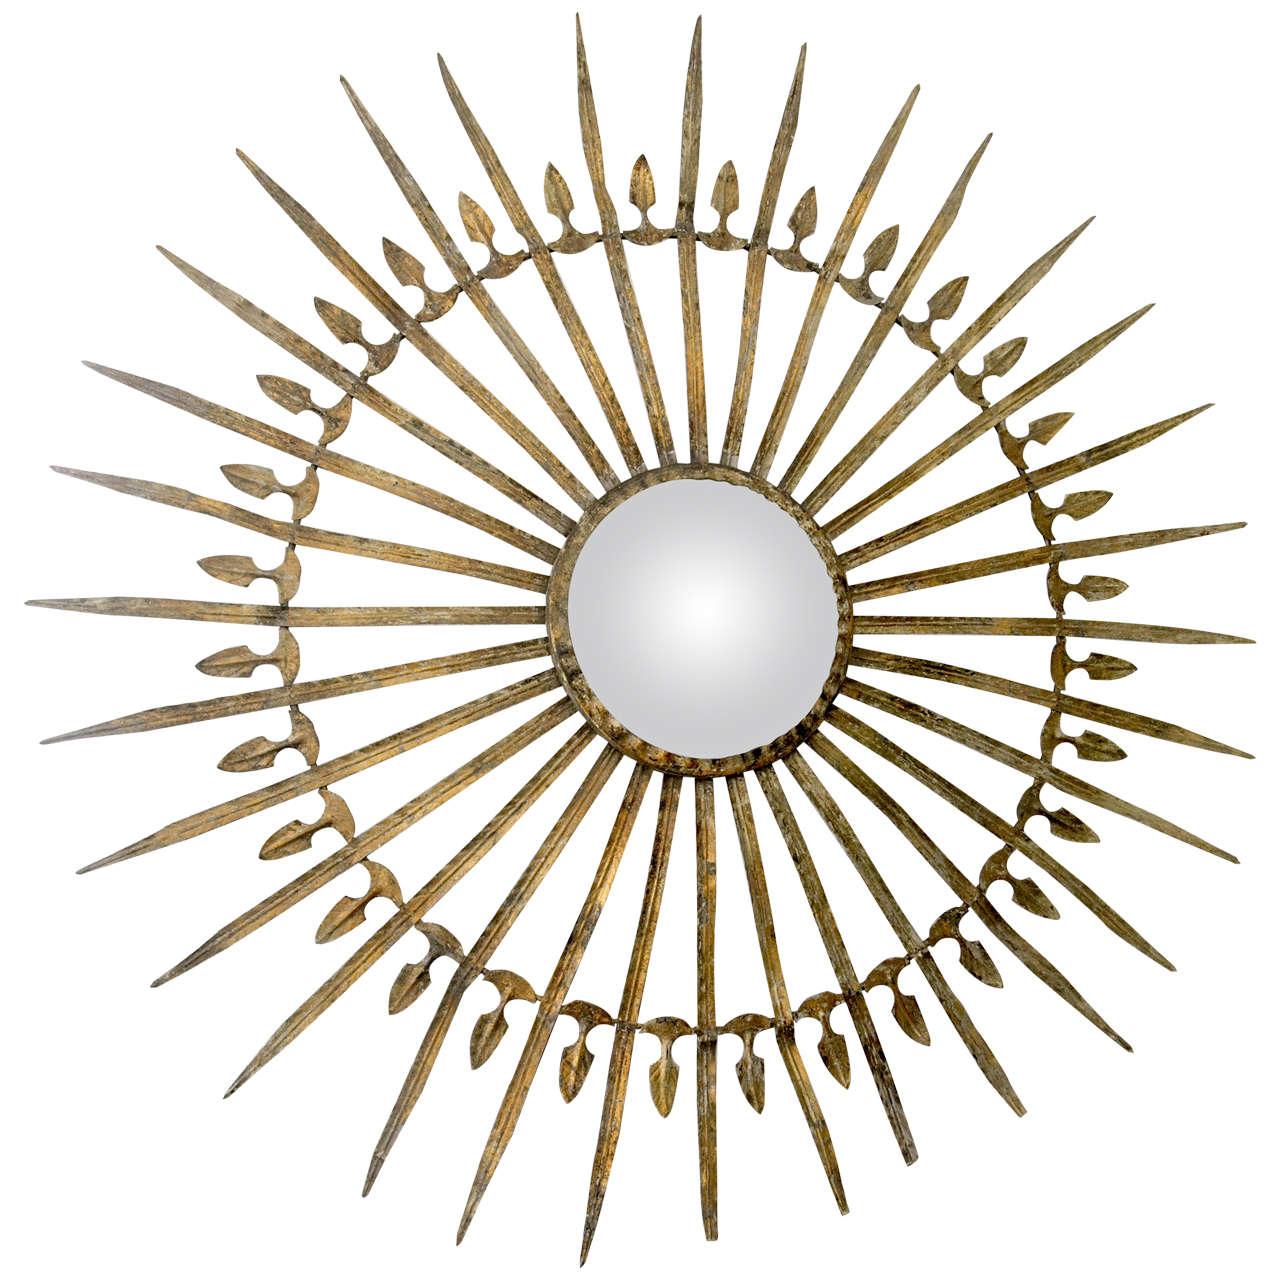 Metal Starburst Mirror with Detailed Arms